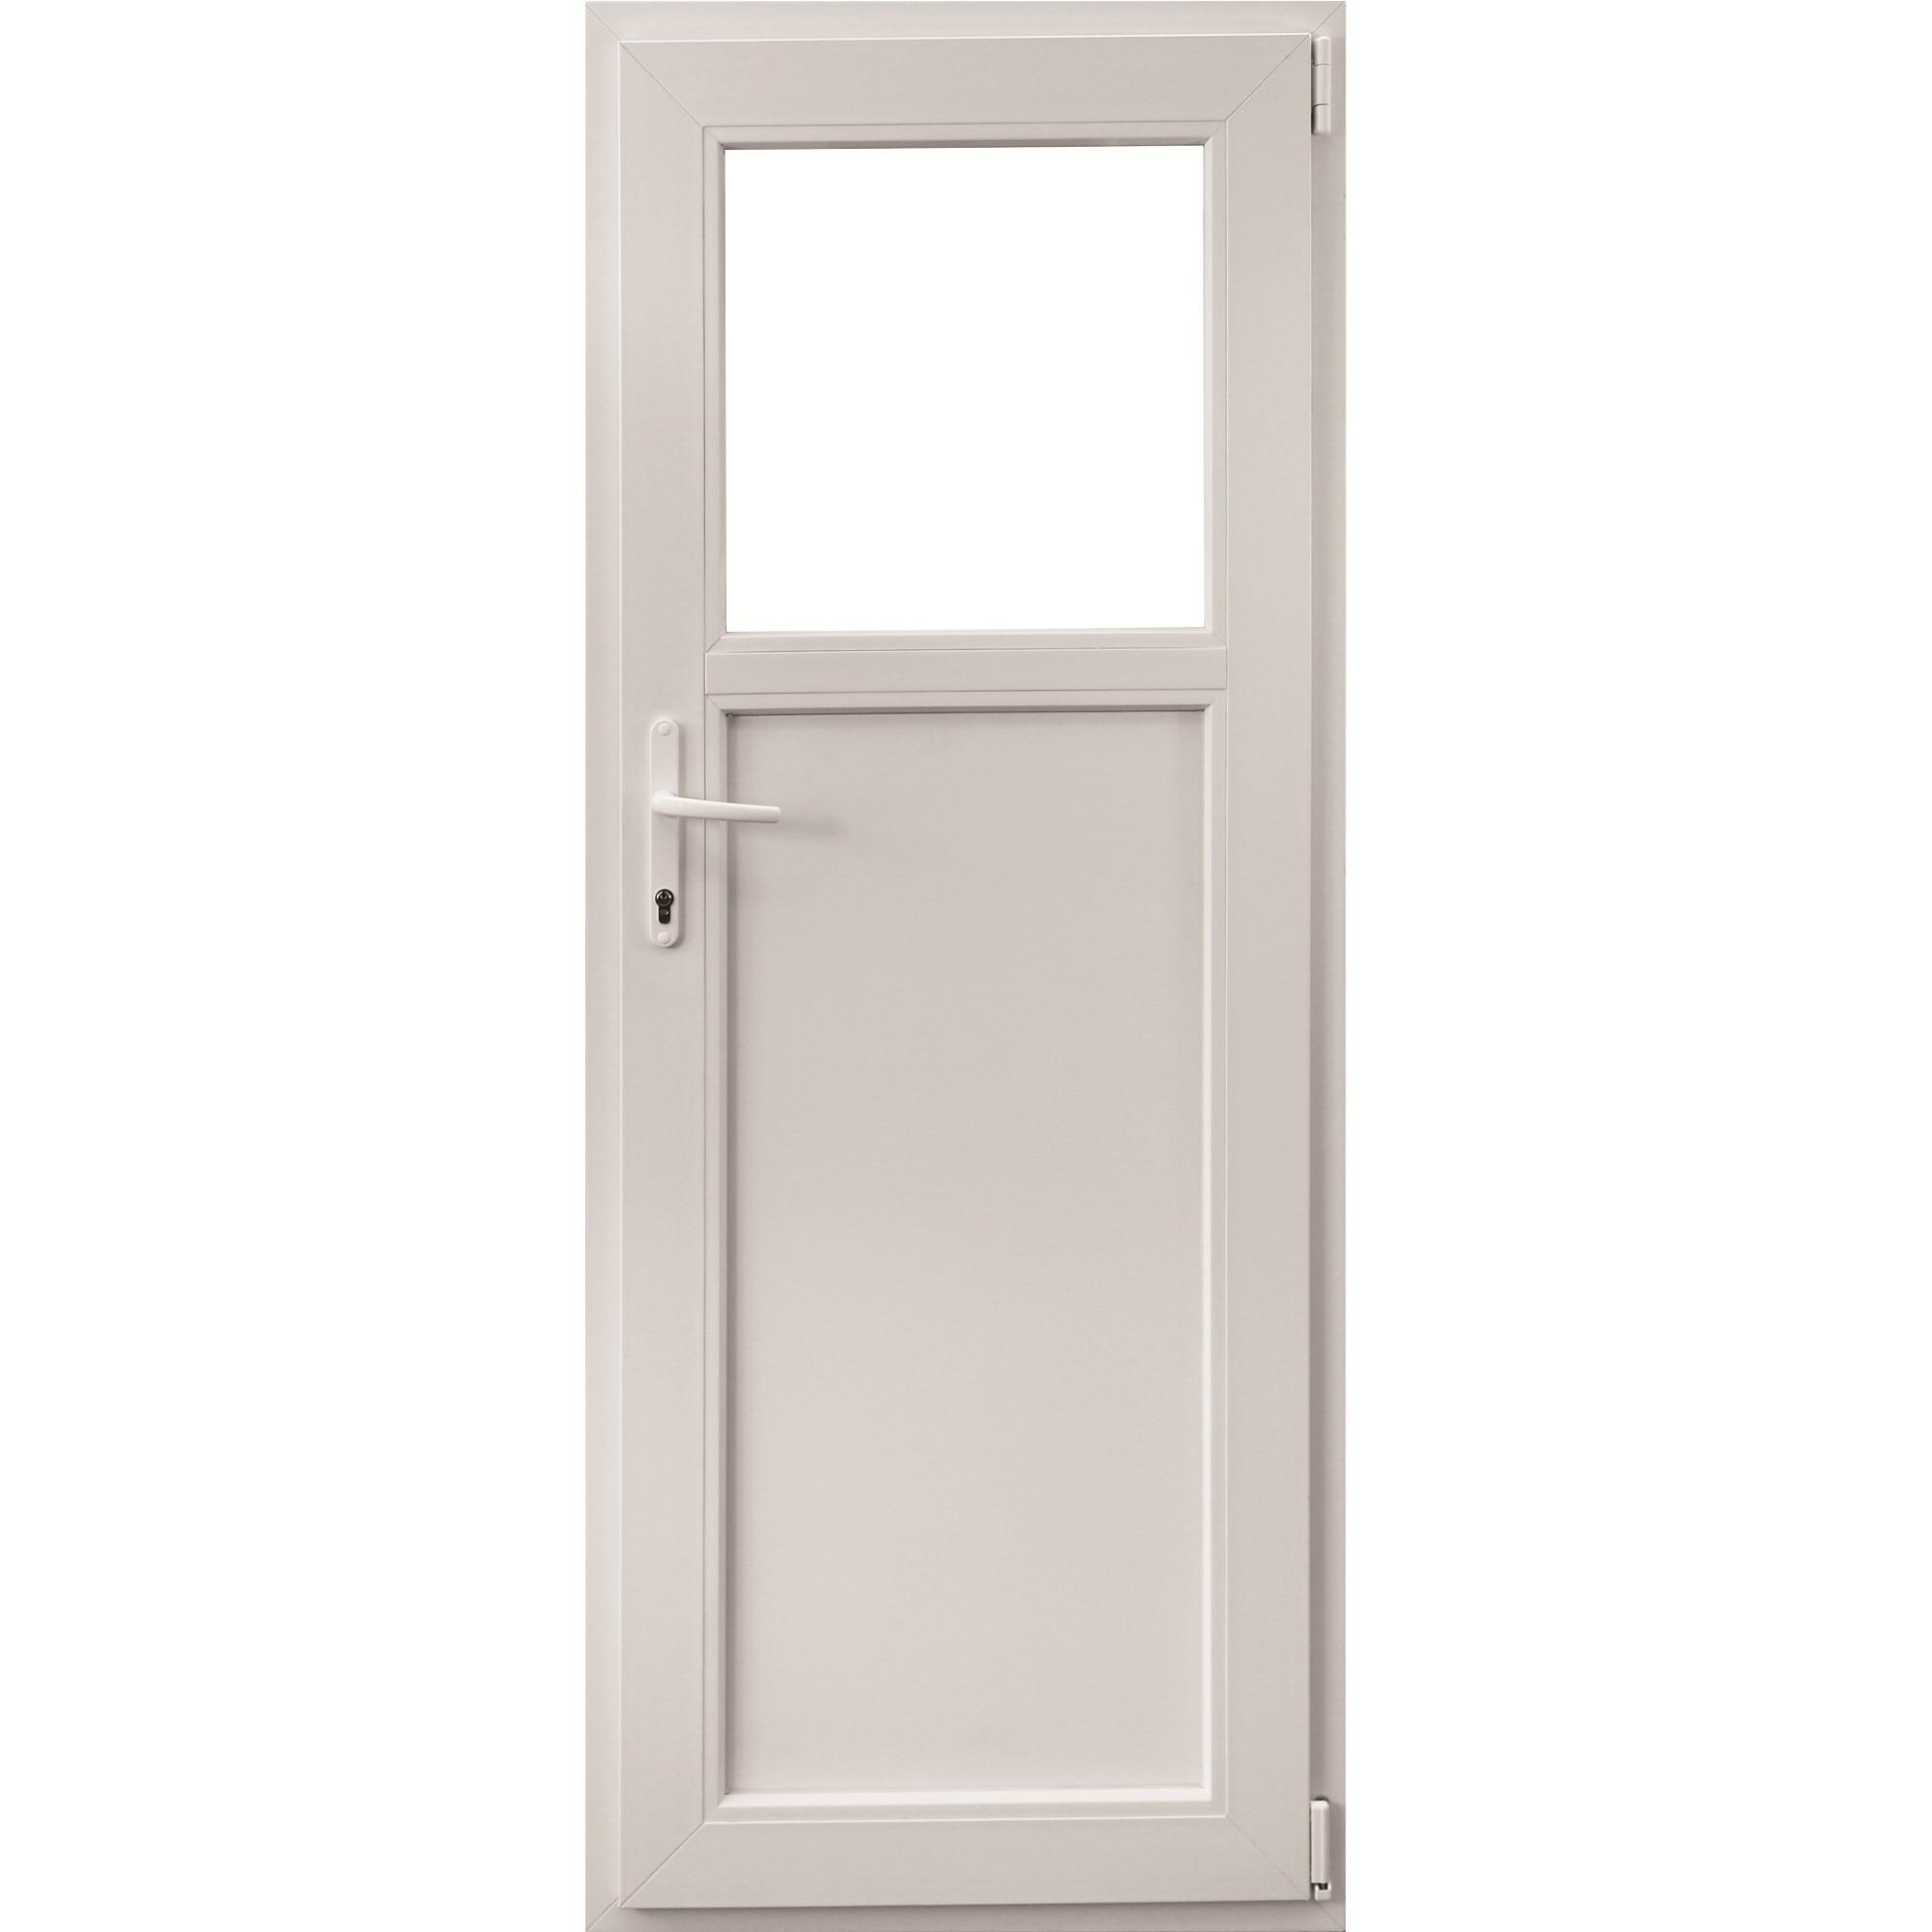 Fotografie Usa termopan, Aplast, PVC , 760 mm x 1880 mm, 1/3 sticla, Alb, deschidere pe dreapta